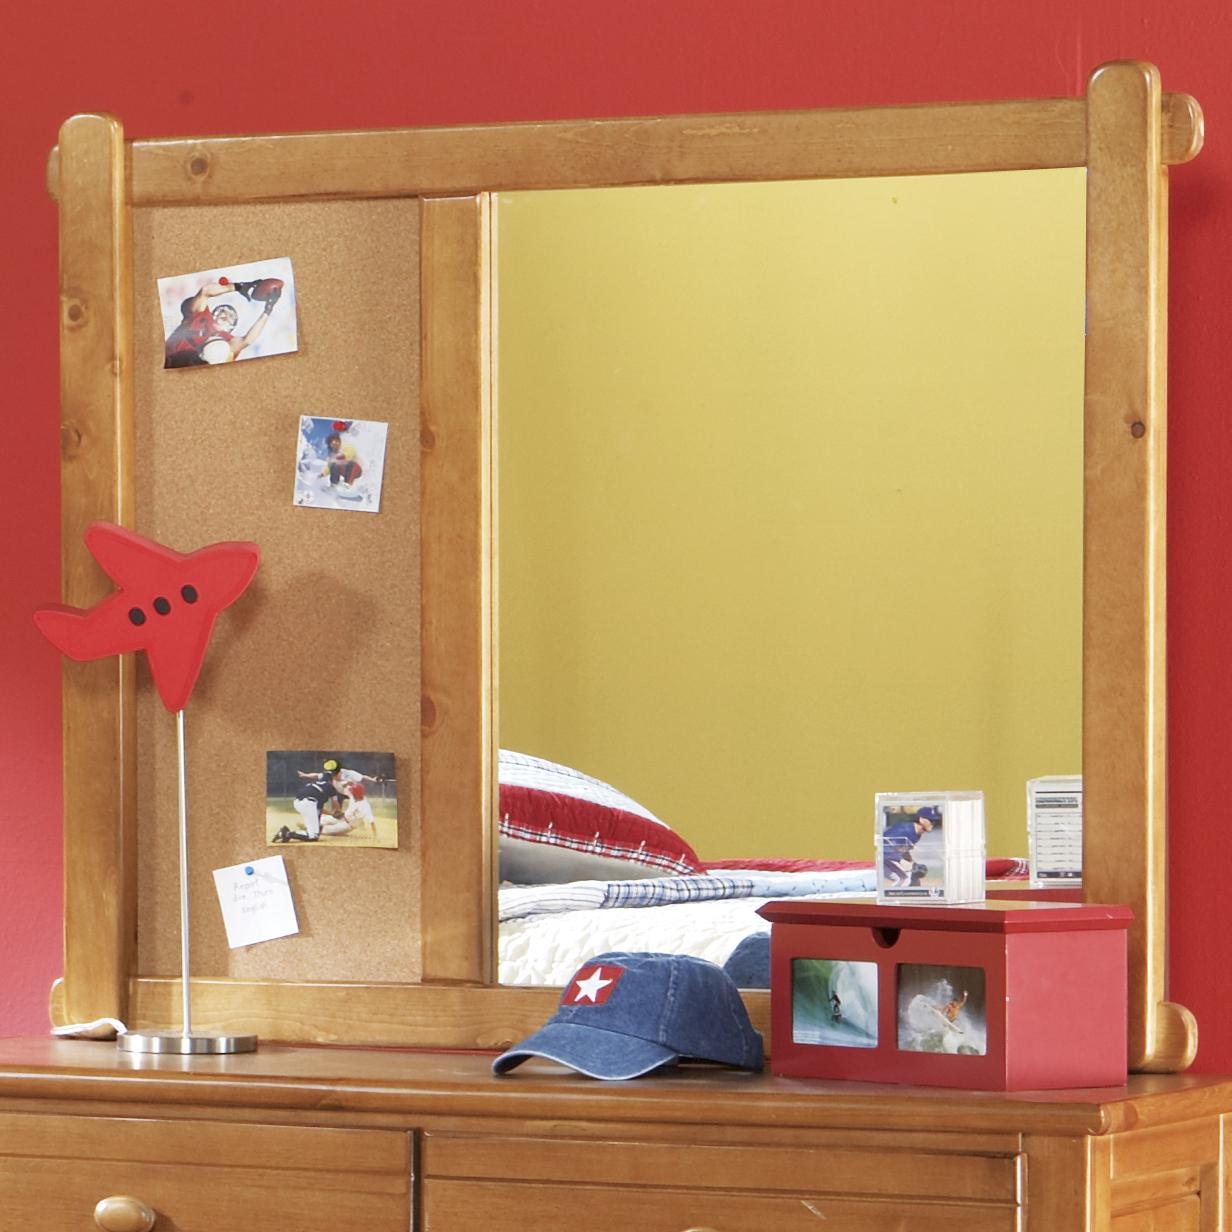 Morris Home Furnishings Cisco Cisco Landscape Mirror - Item Number: 90H-320